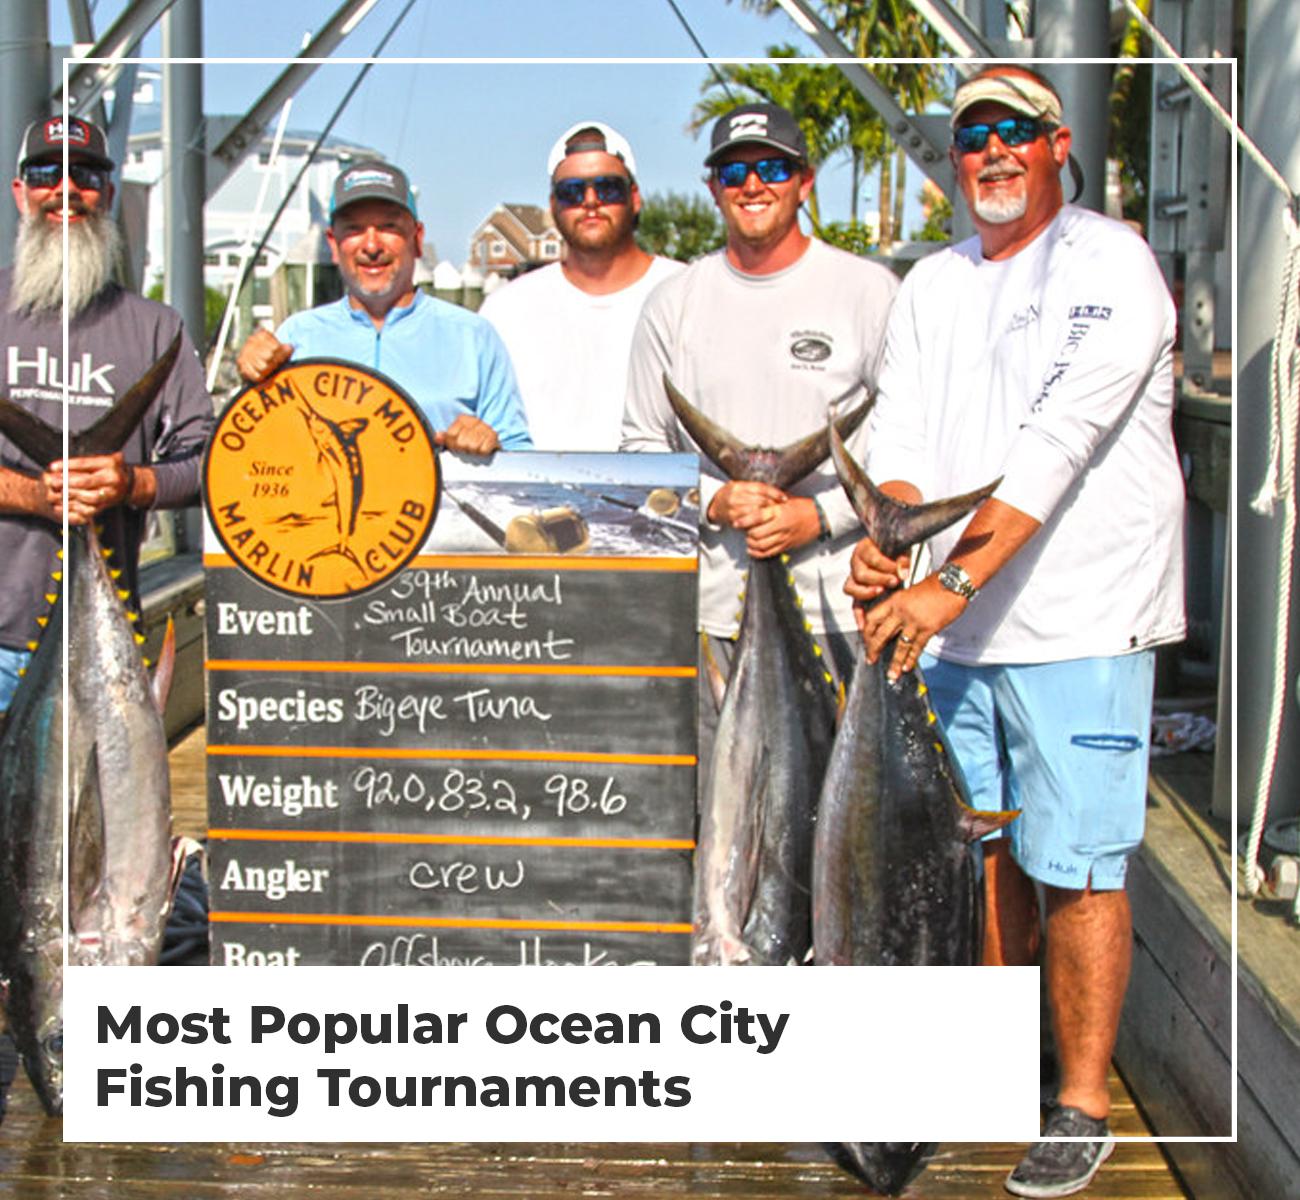 Ocean City Fishing Tournaments